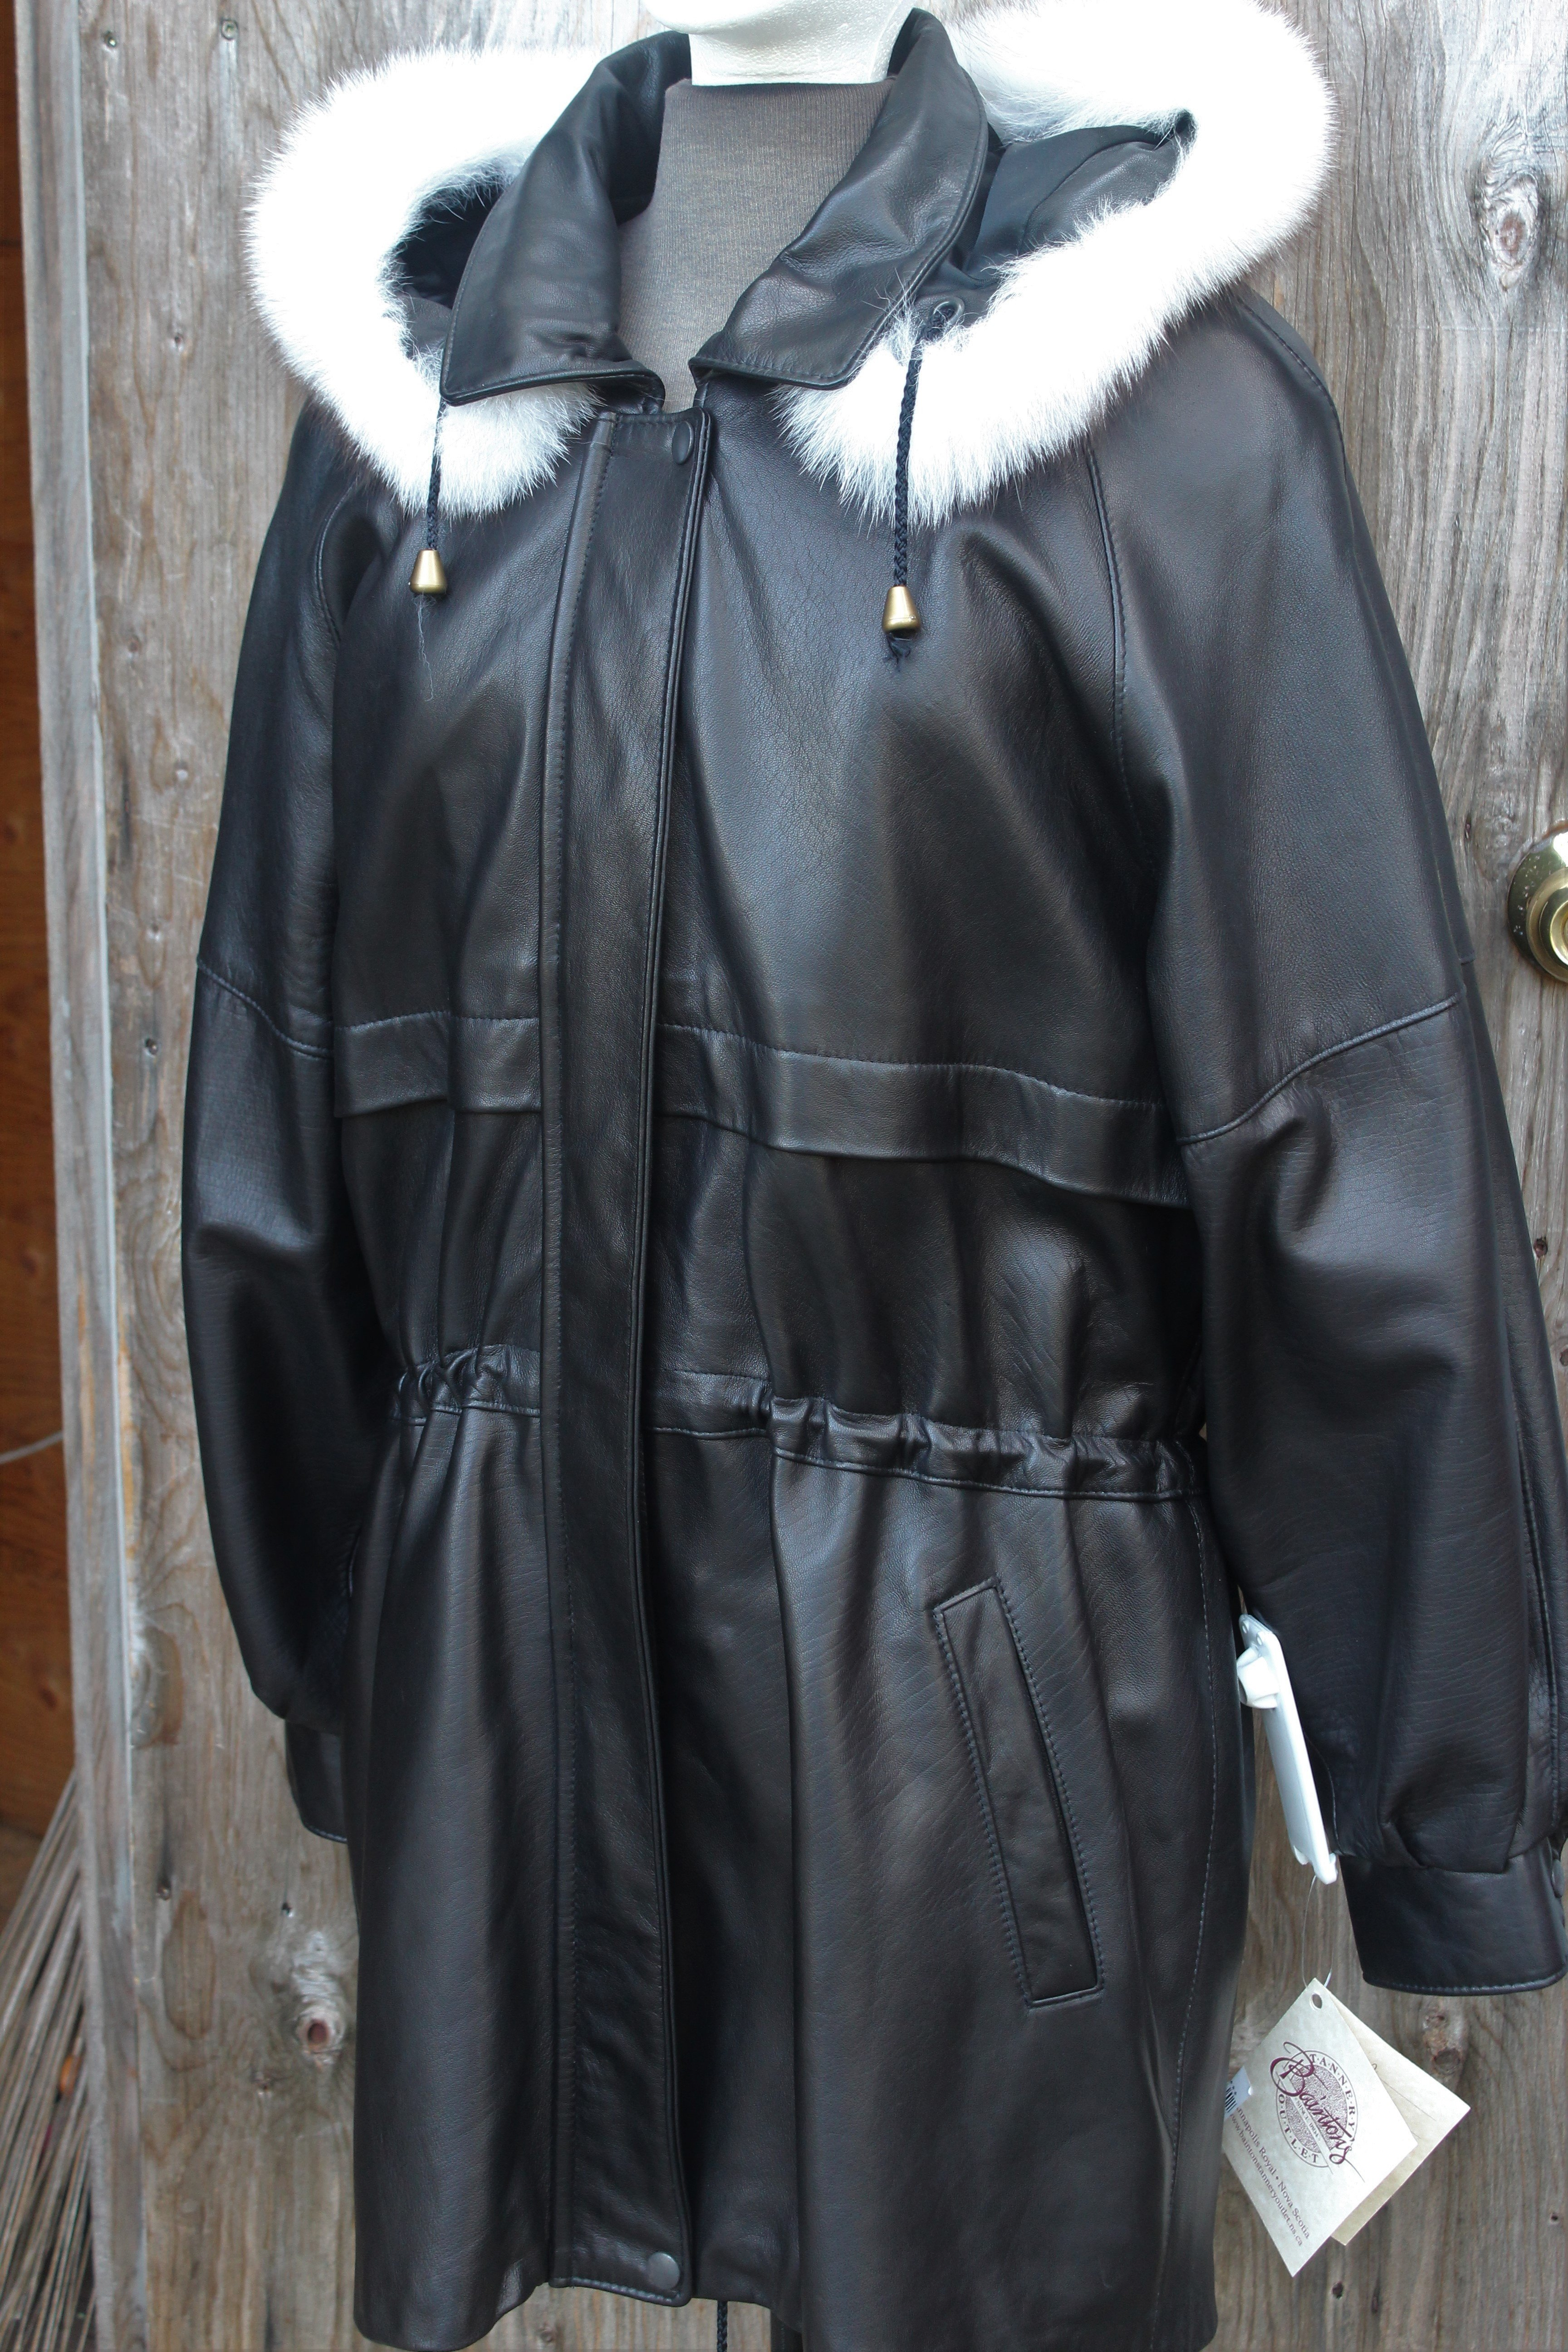 Naked Black- $499.95 Bainton's: Style #9701NBKS